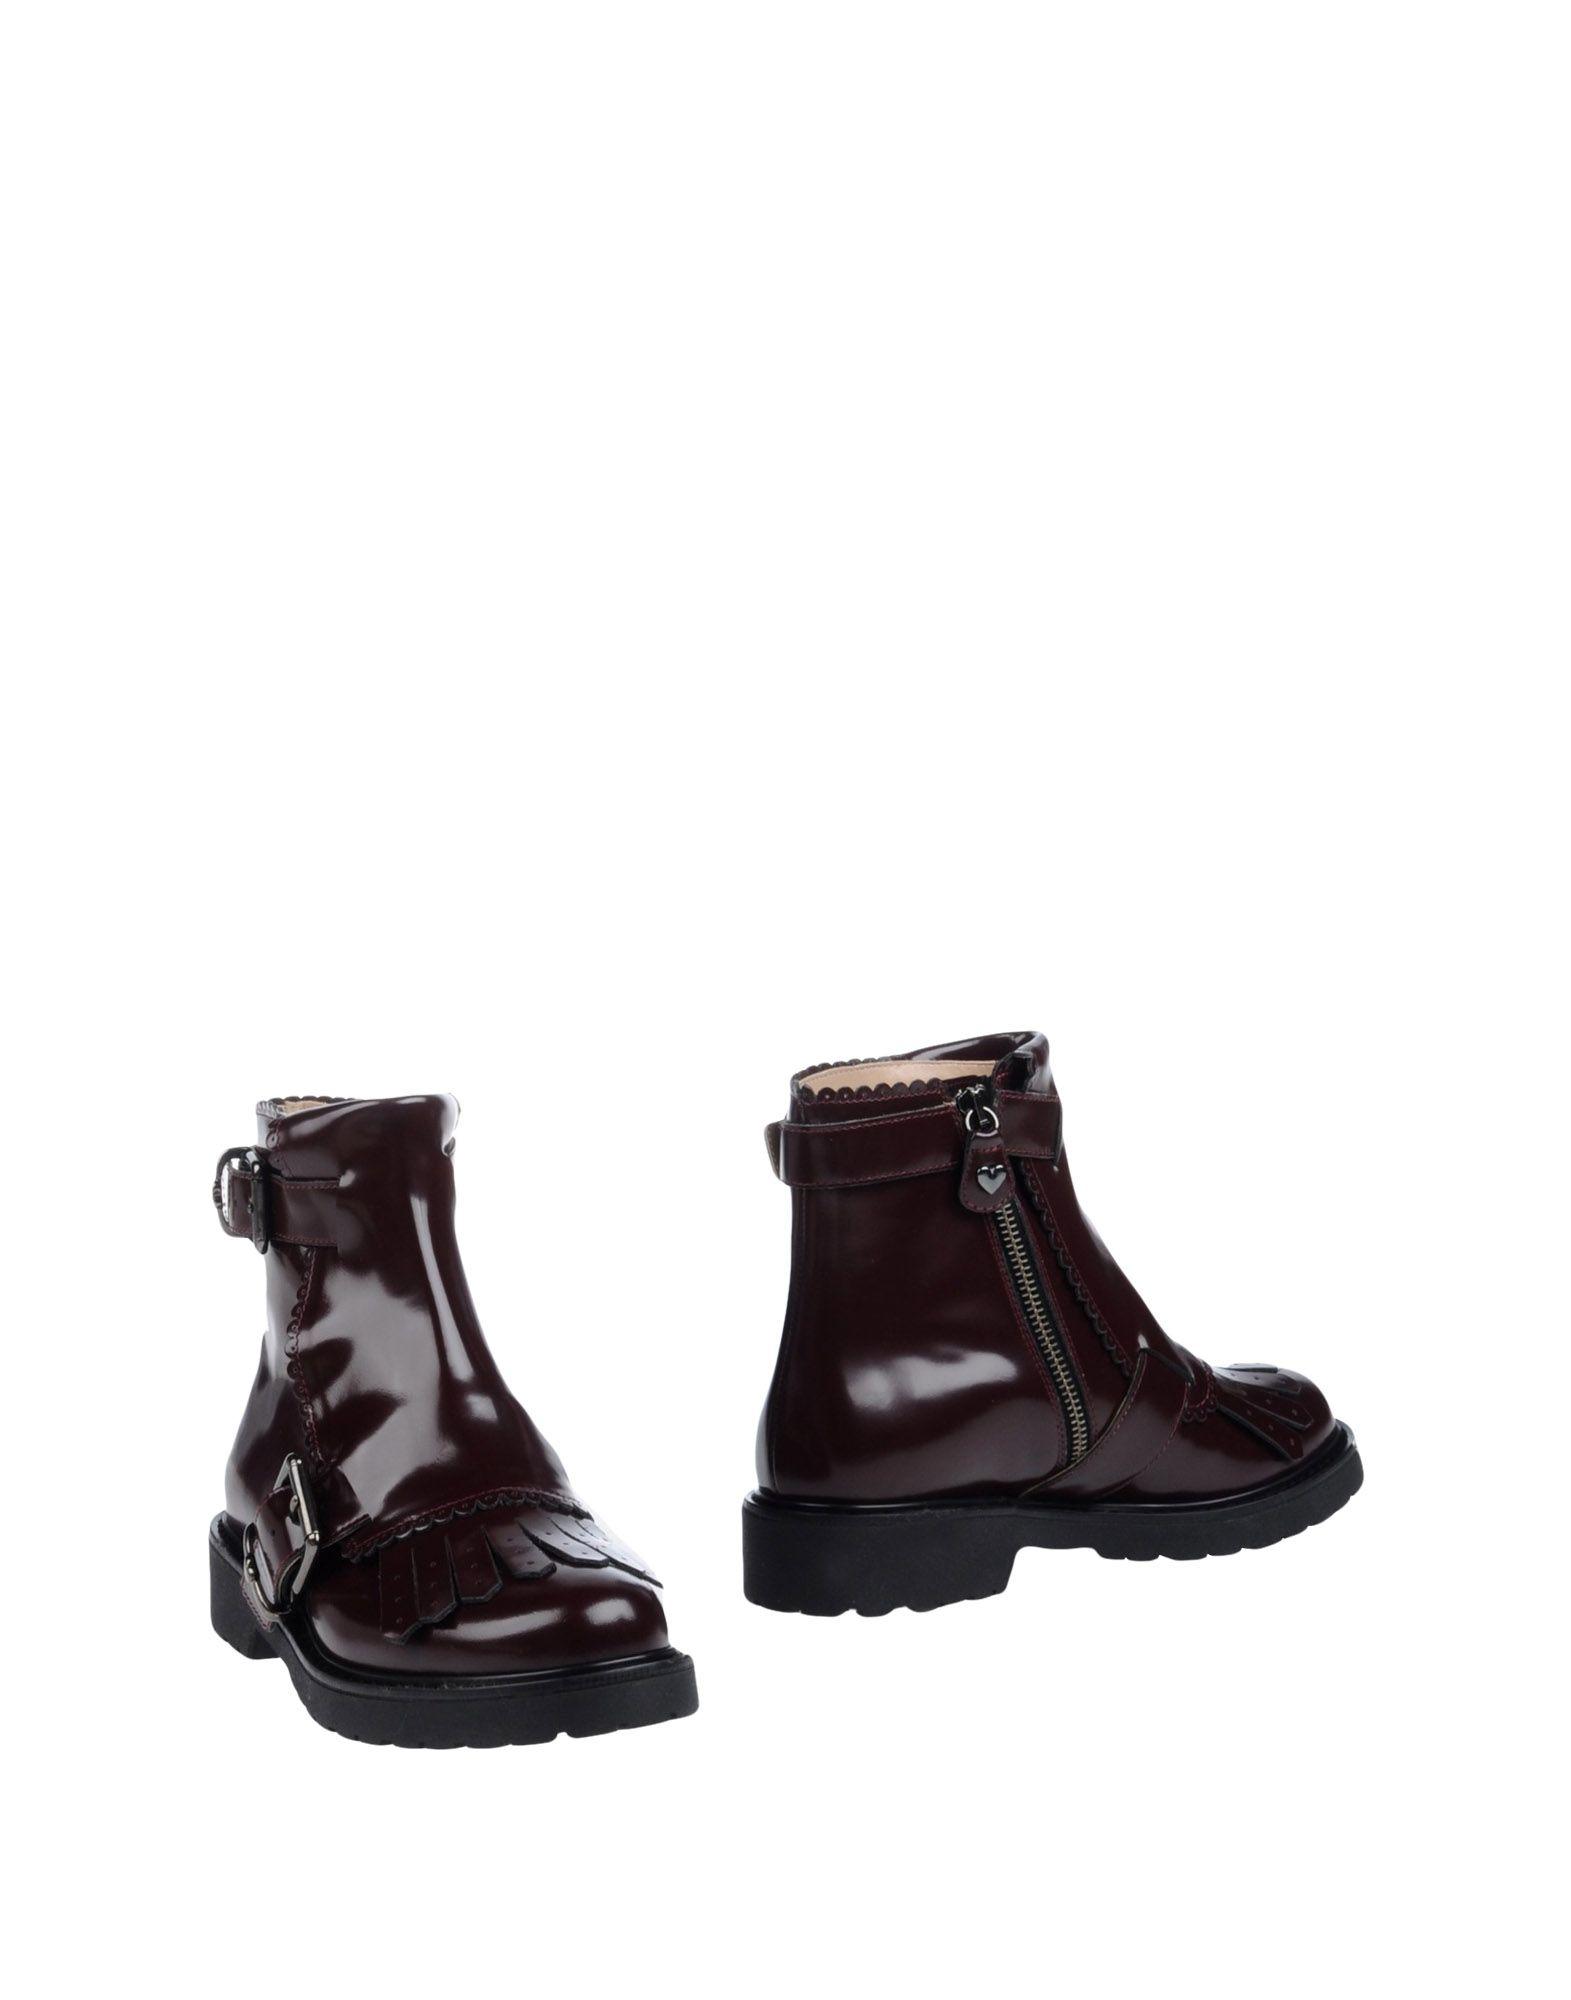 Haltbare Schuhe Mode billige Schuhe Haltbare Twin 11245724SJ Beliebte Schuhe d09e5f